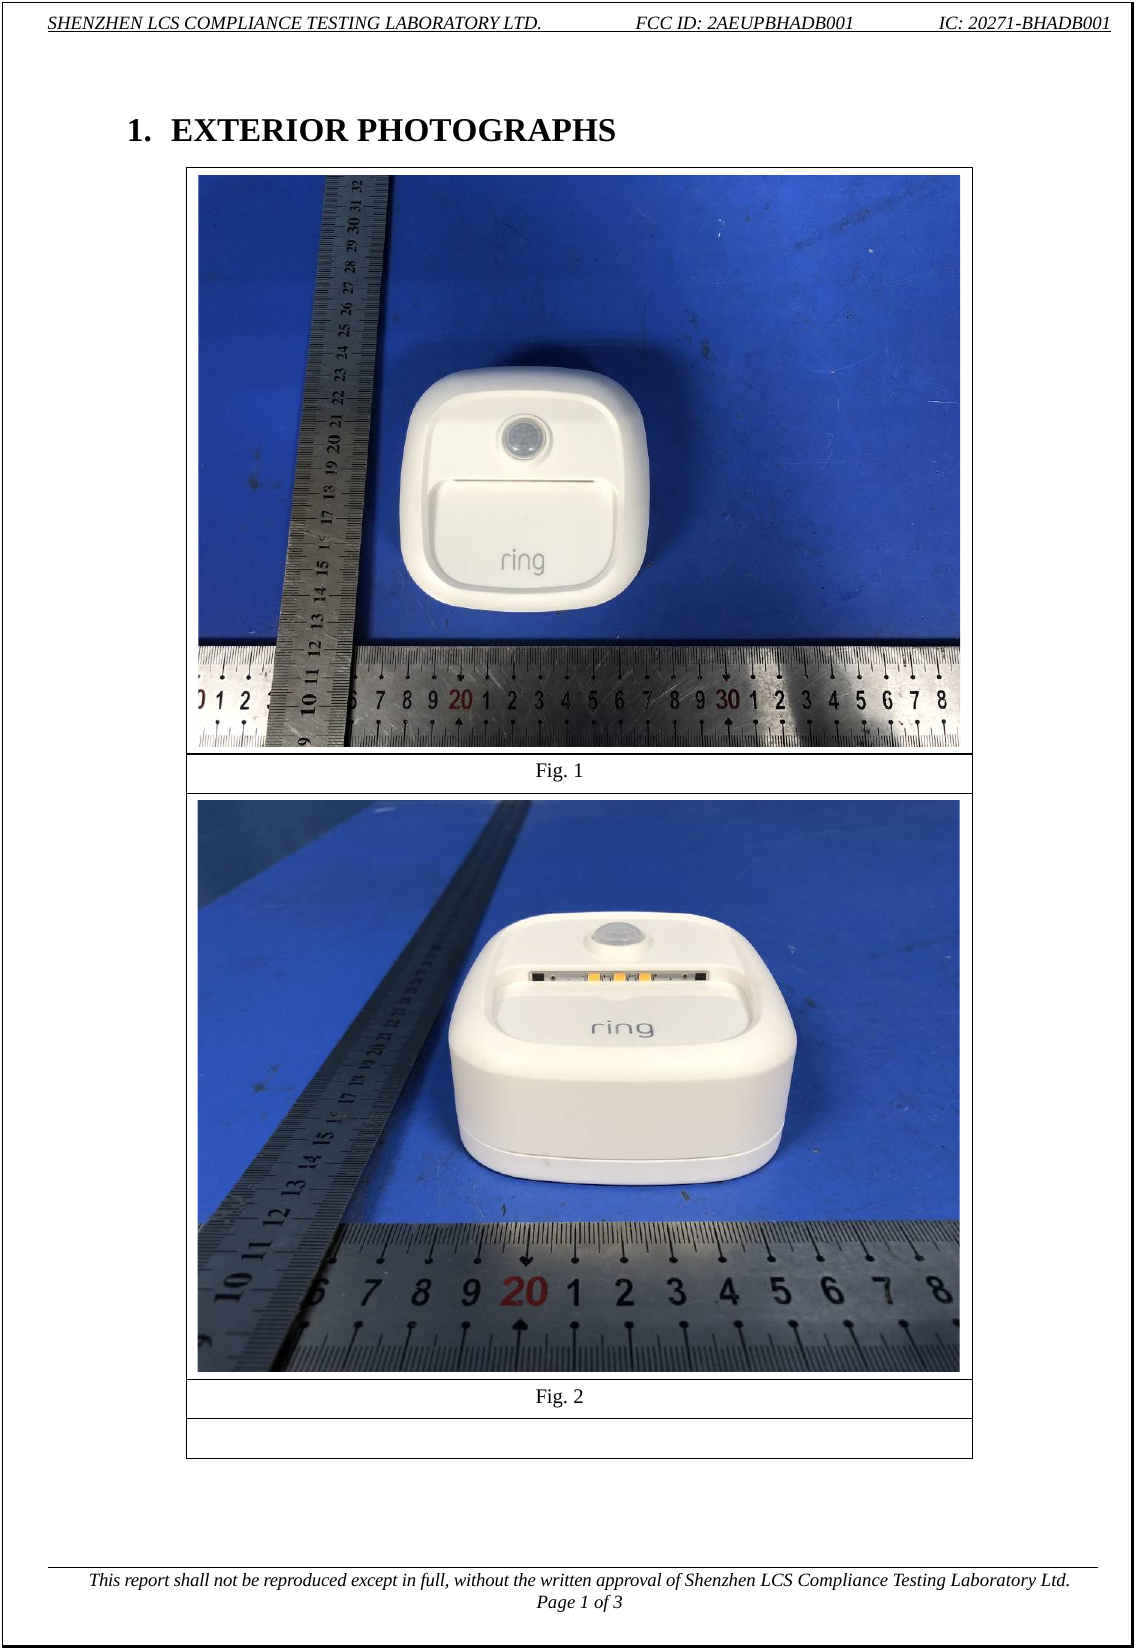 Ring LLC Steplight BHADB001 (2AEUPBHADB001) FCC